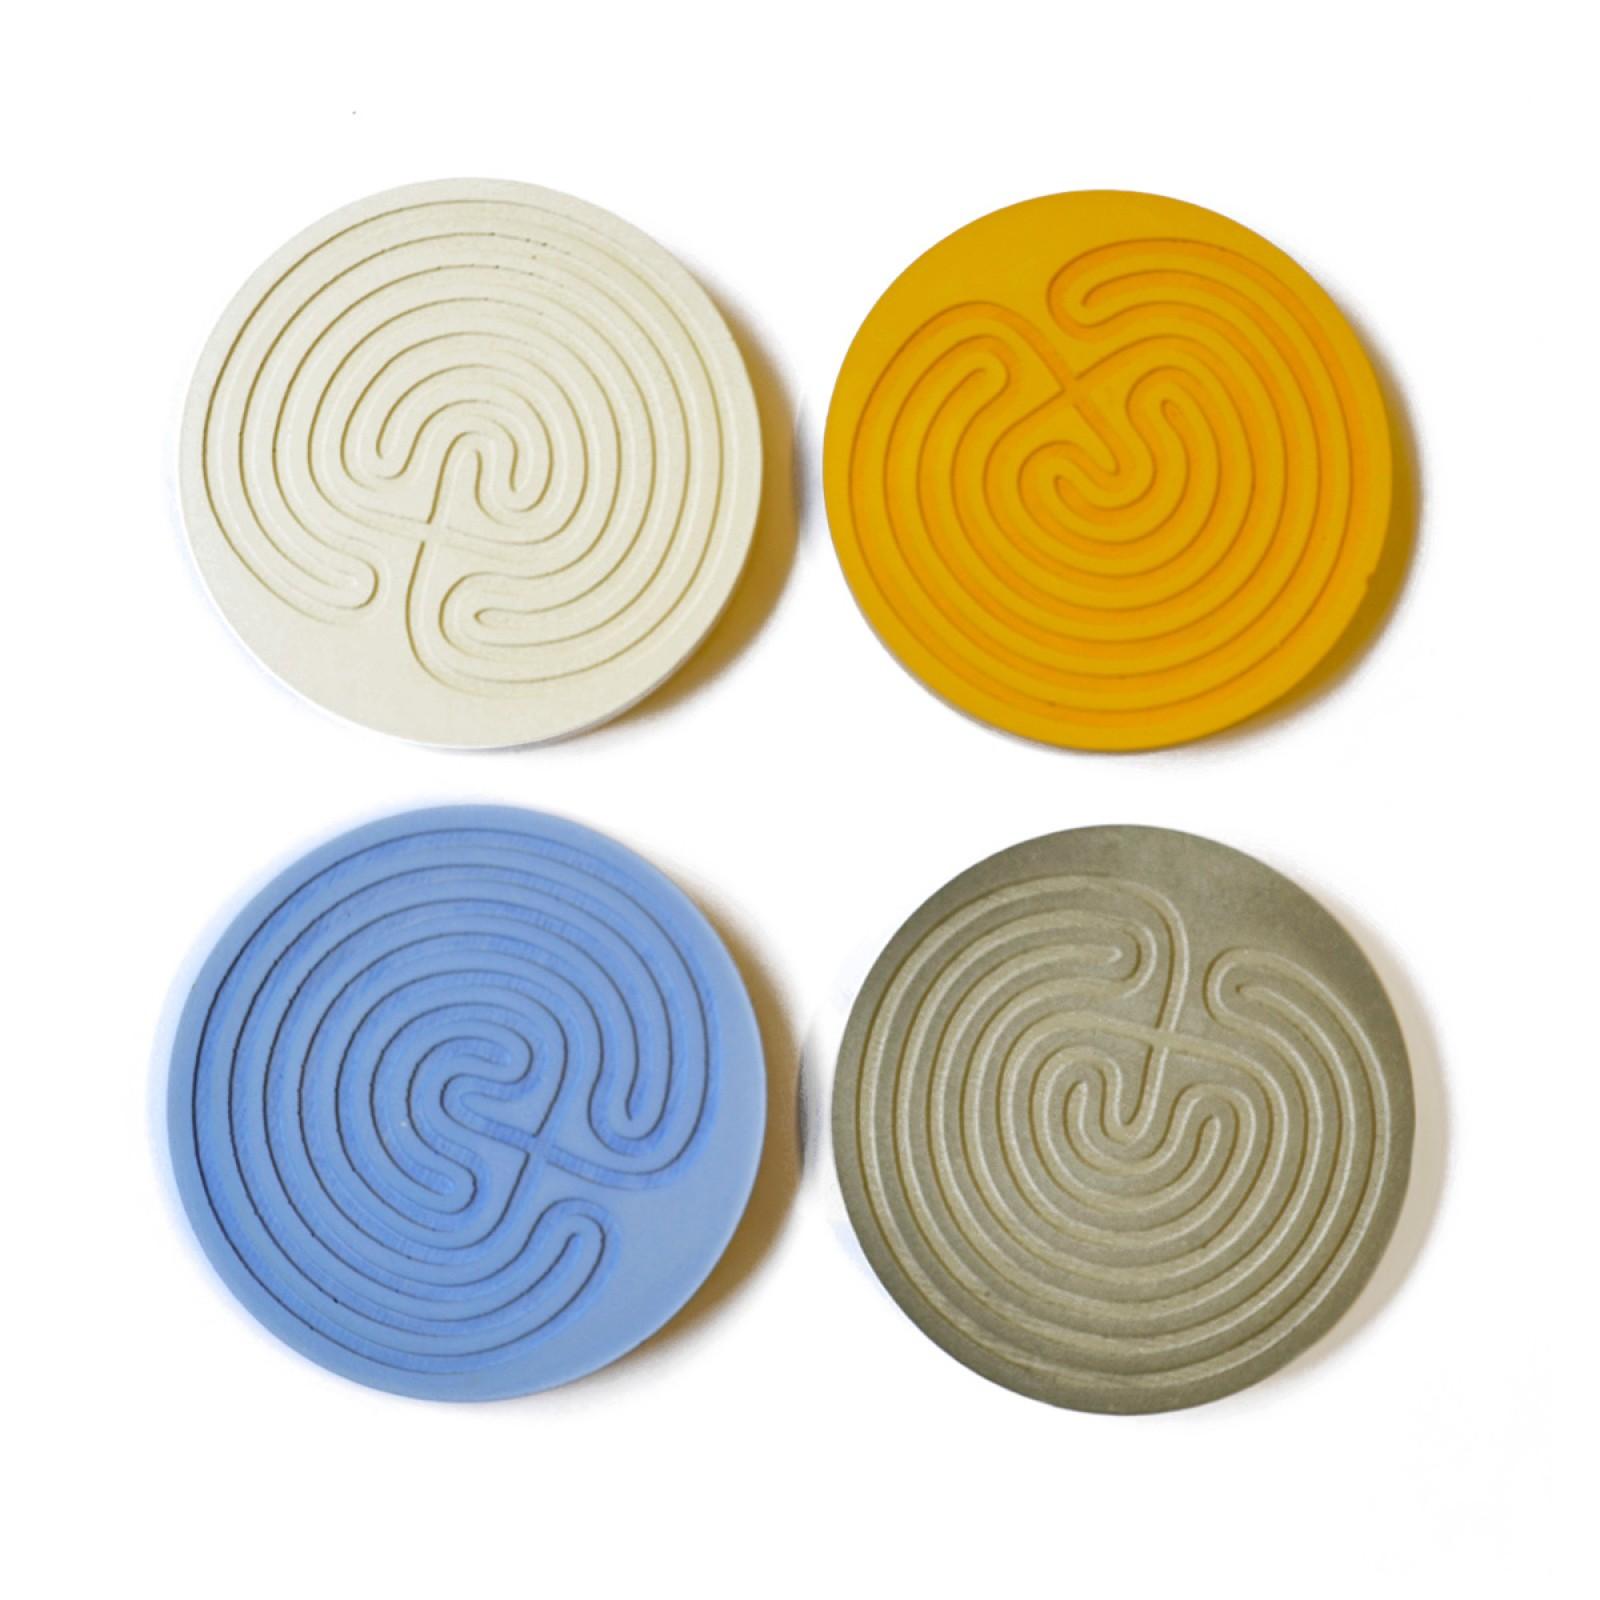 Knossos Round Concrete Coasters (set of 4) - A Future Perfect